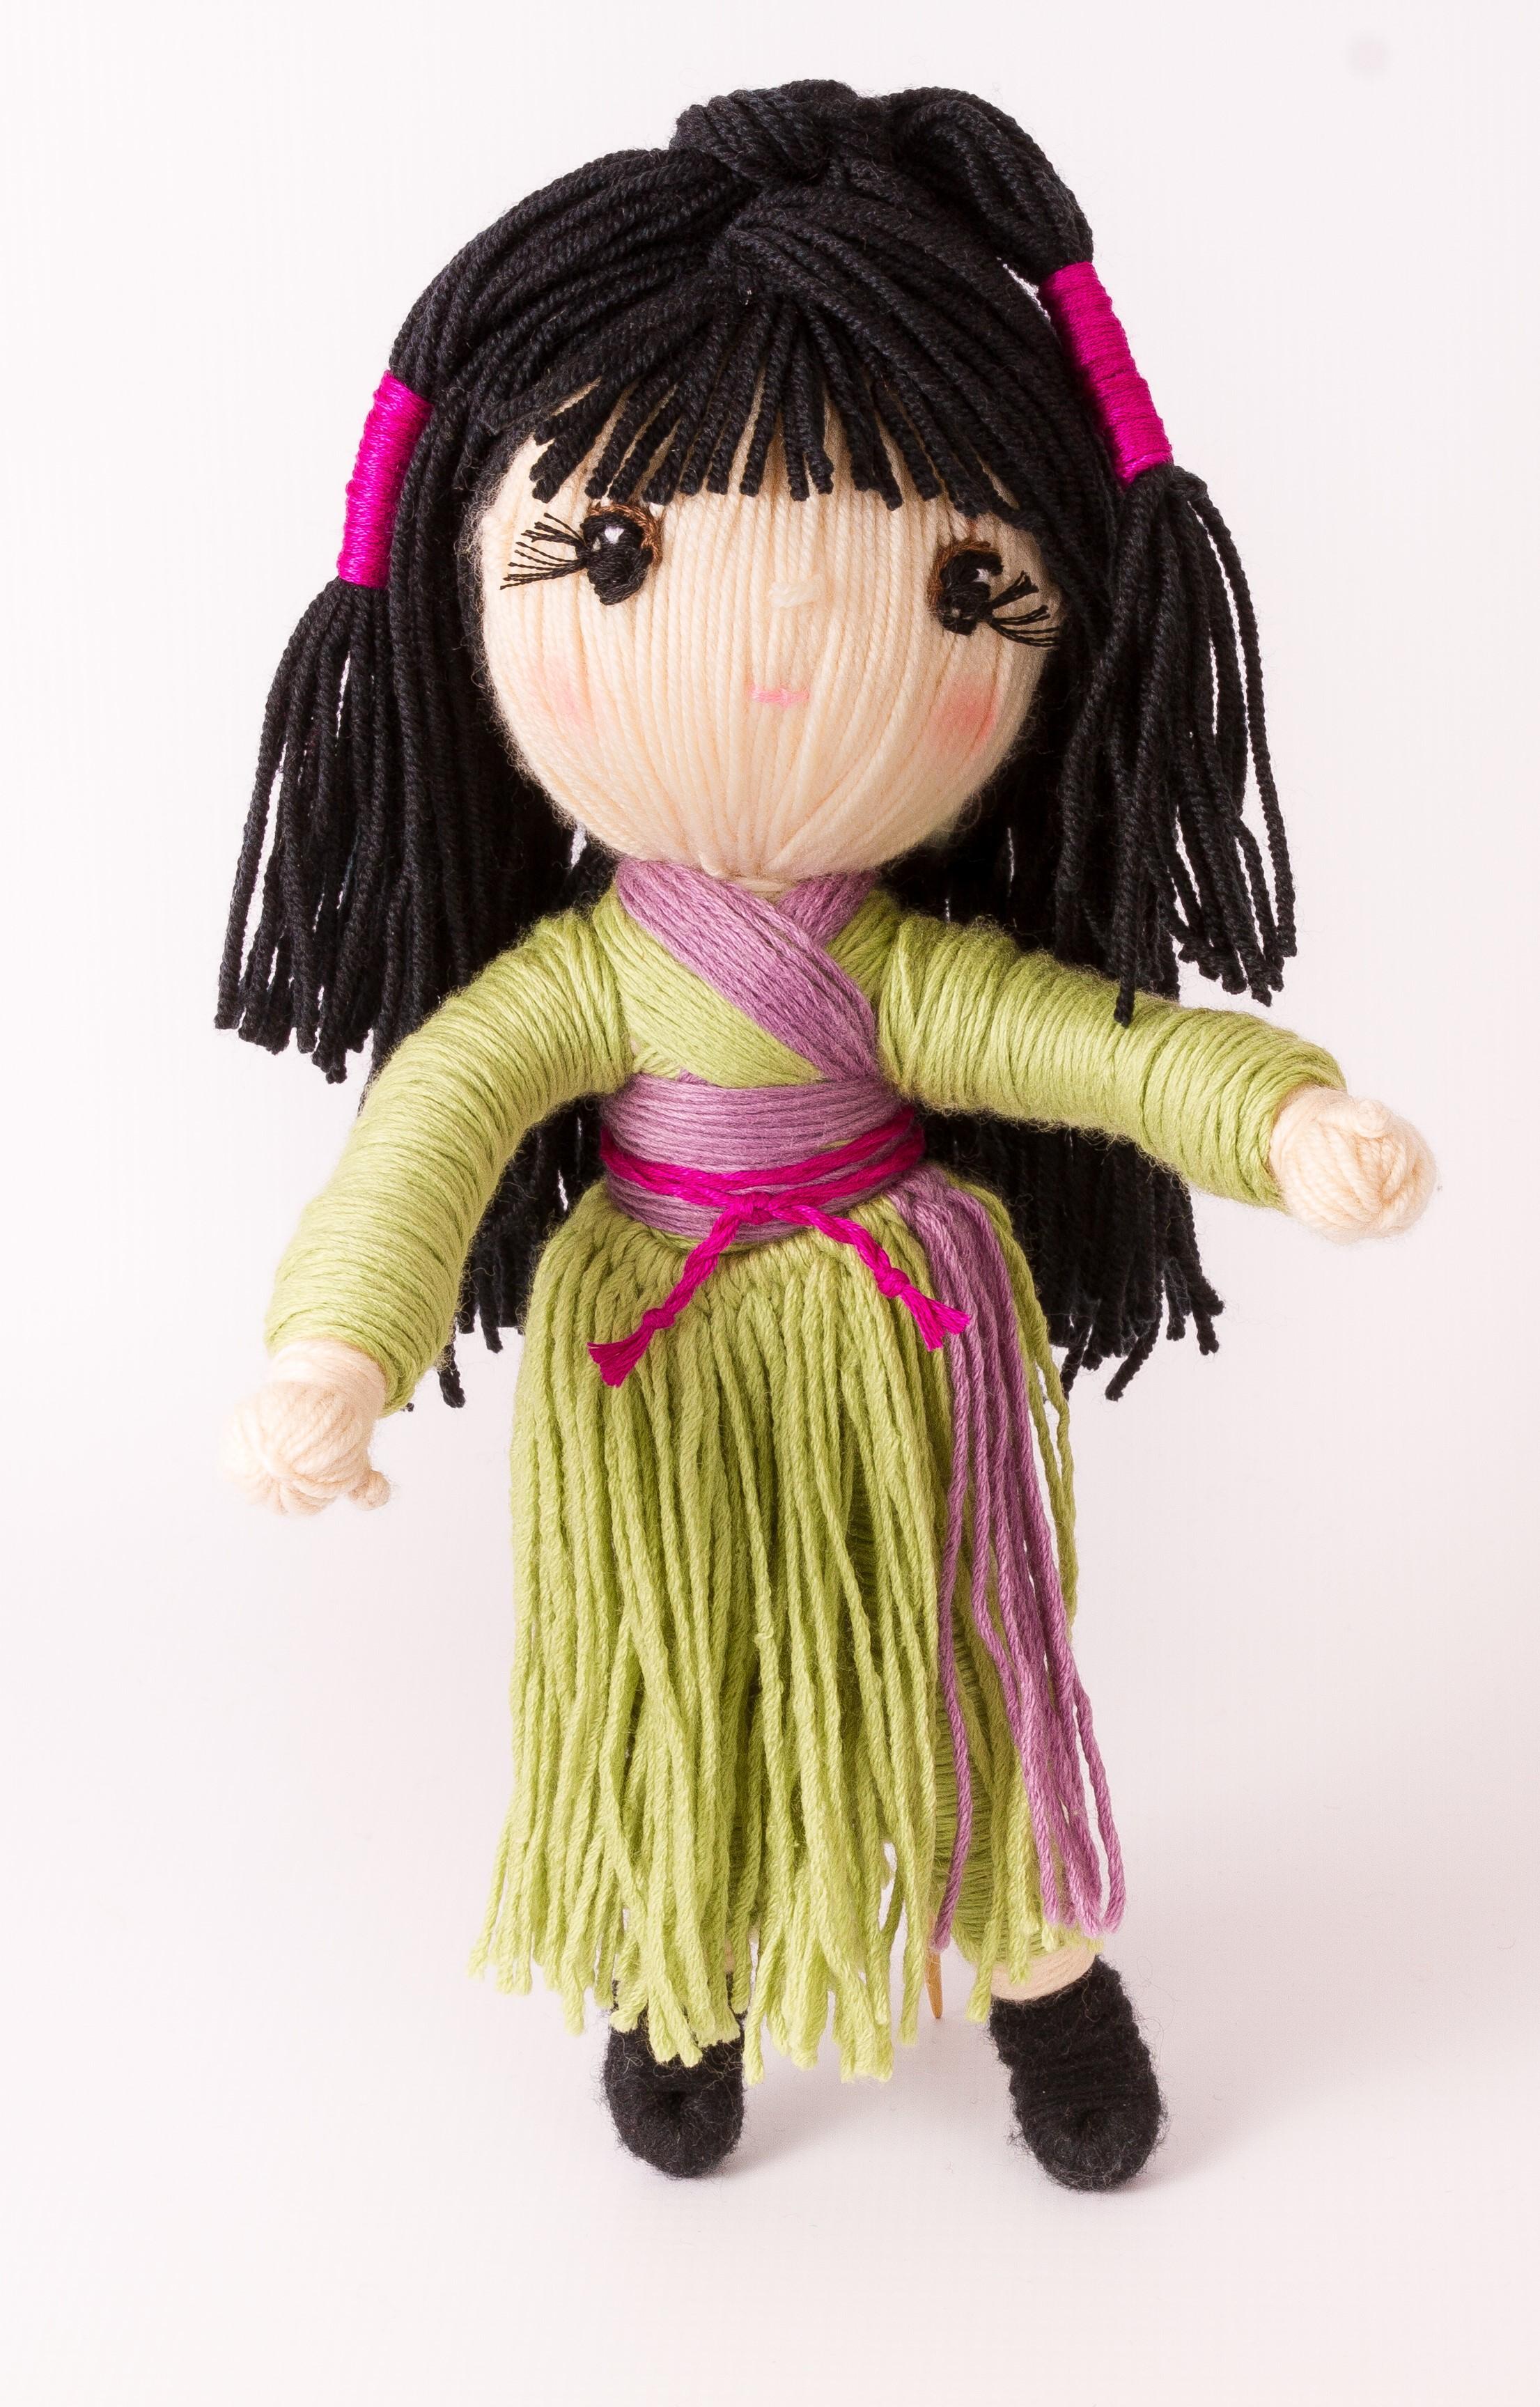 dolls-7459 (2)